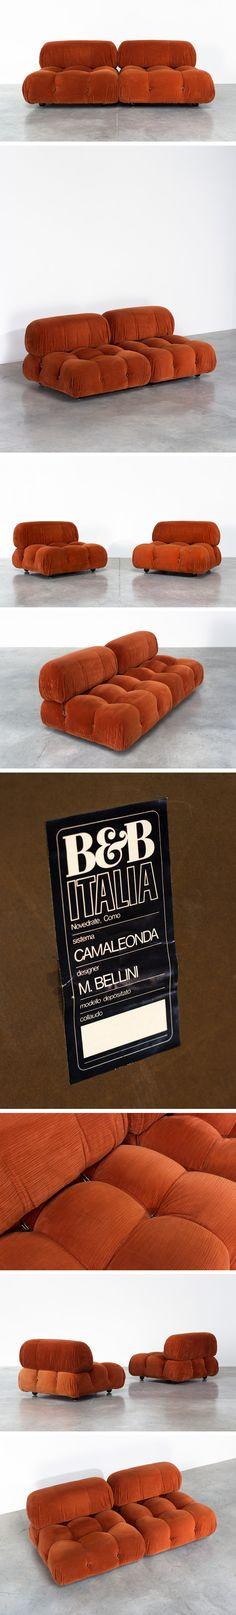 Mario Bellini Camaleonda lounge chairs B&B Italia Large